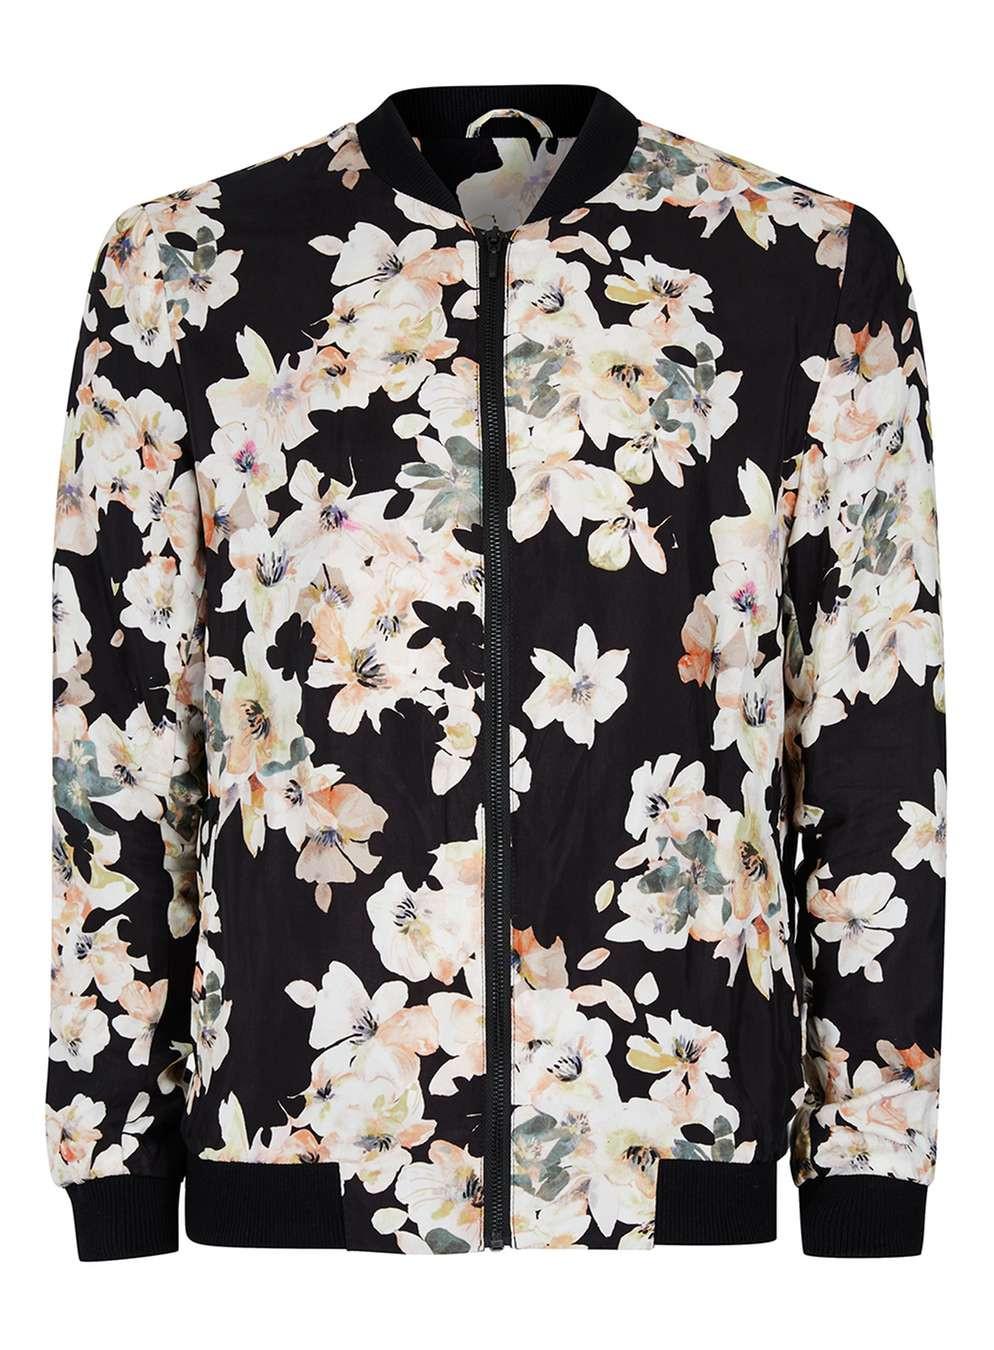 Topman: Floral Bomber Jacket